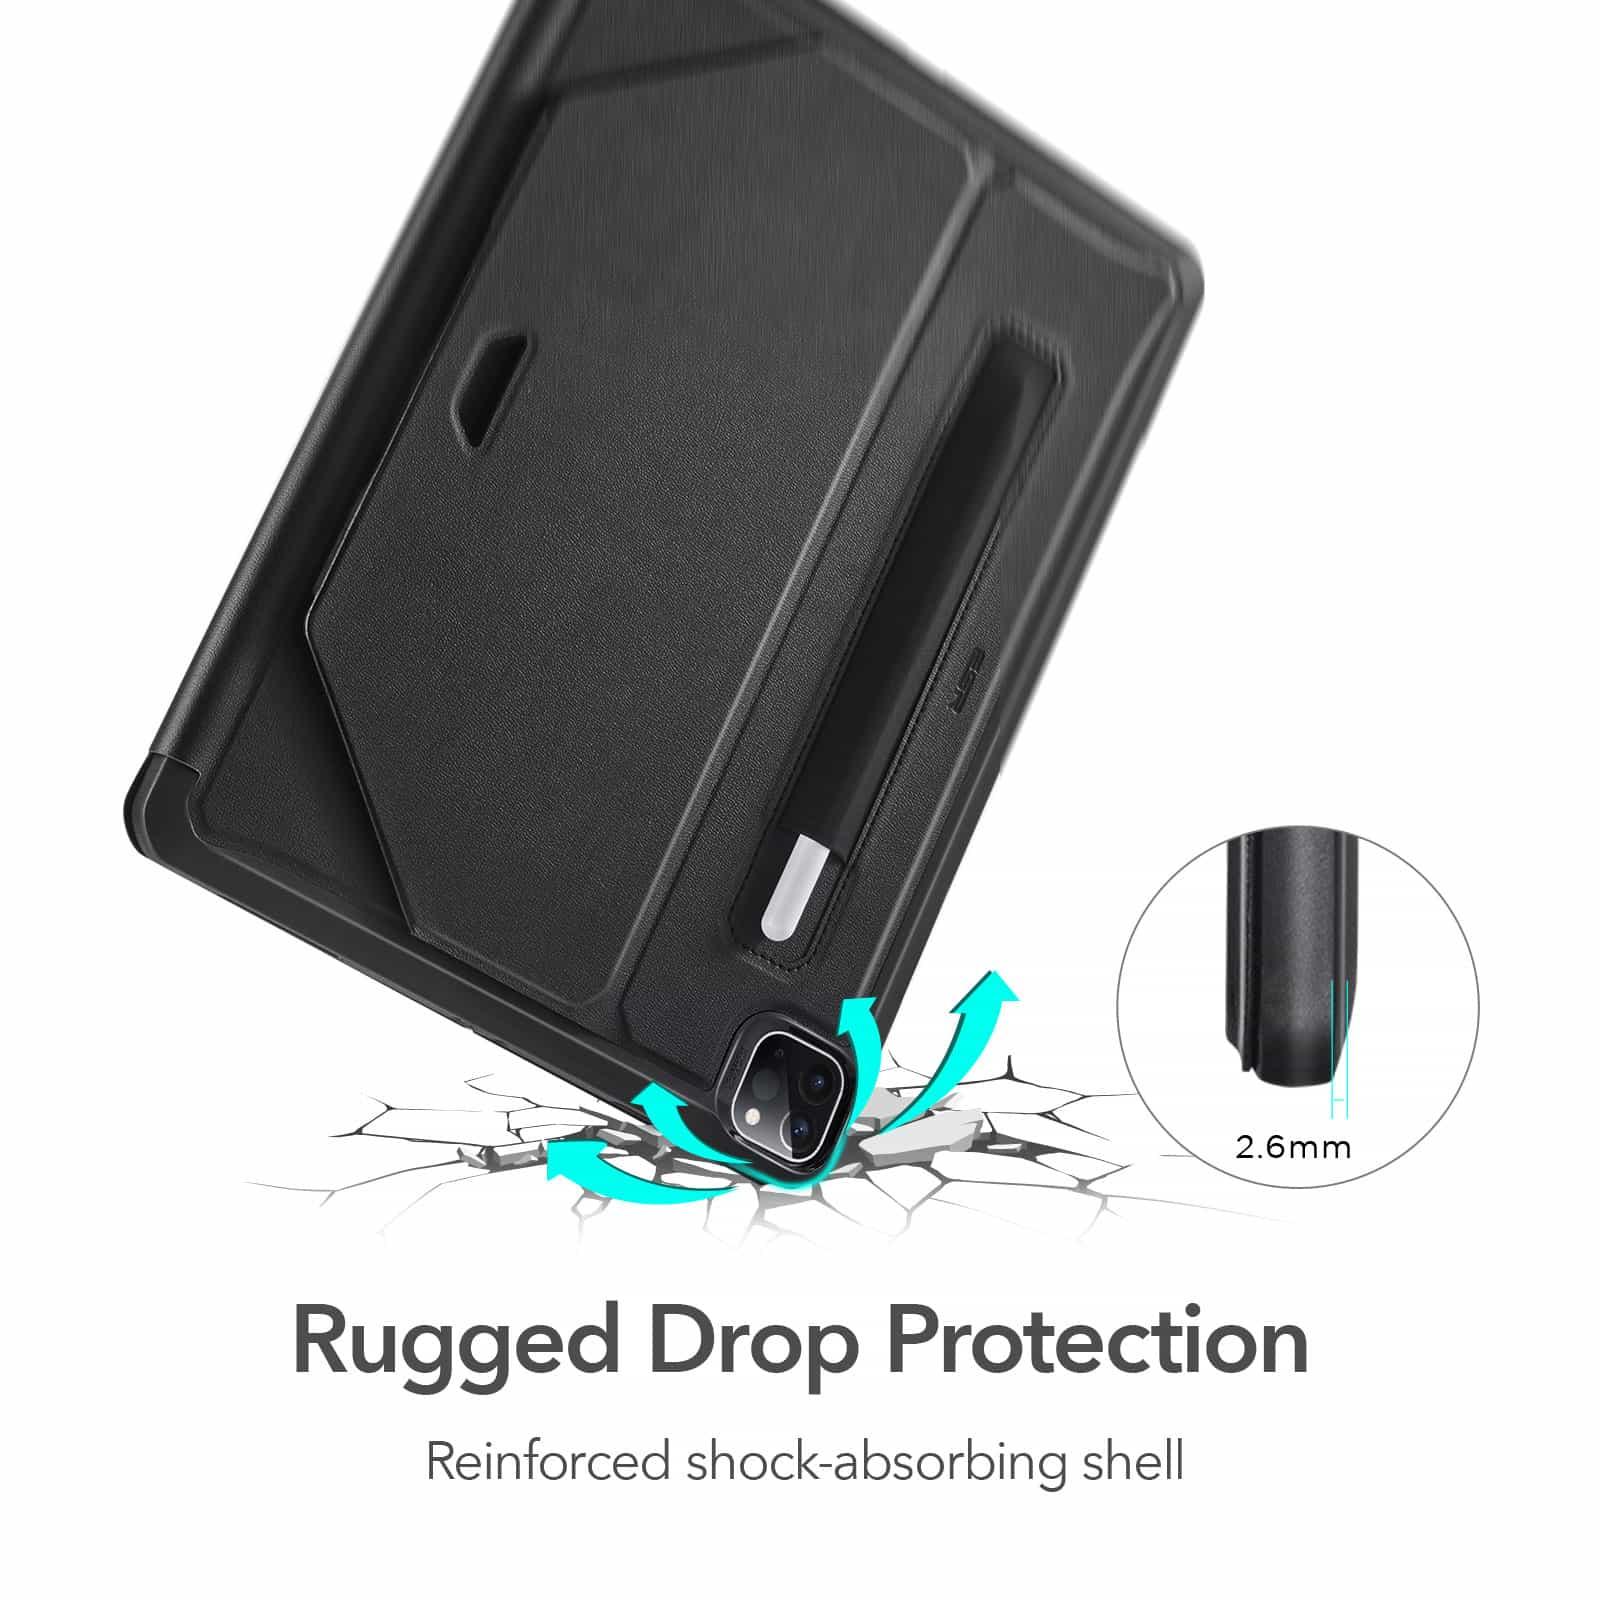 iPad Pro 12.9 2021 Rugged Protection Bundle 6